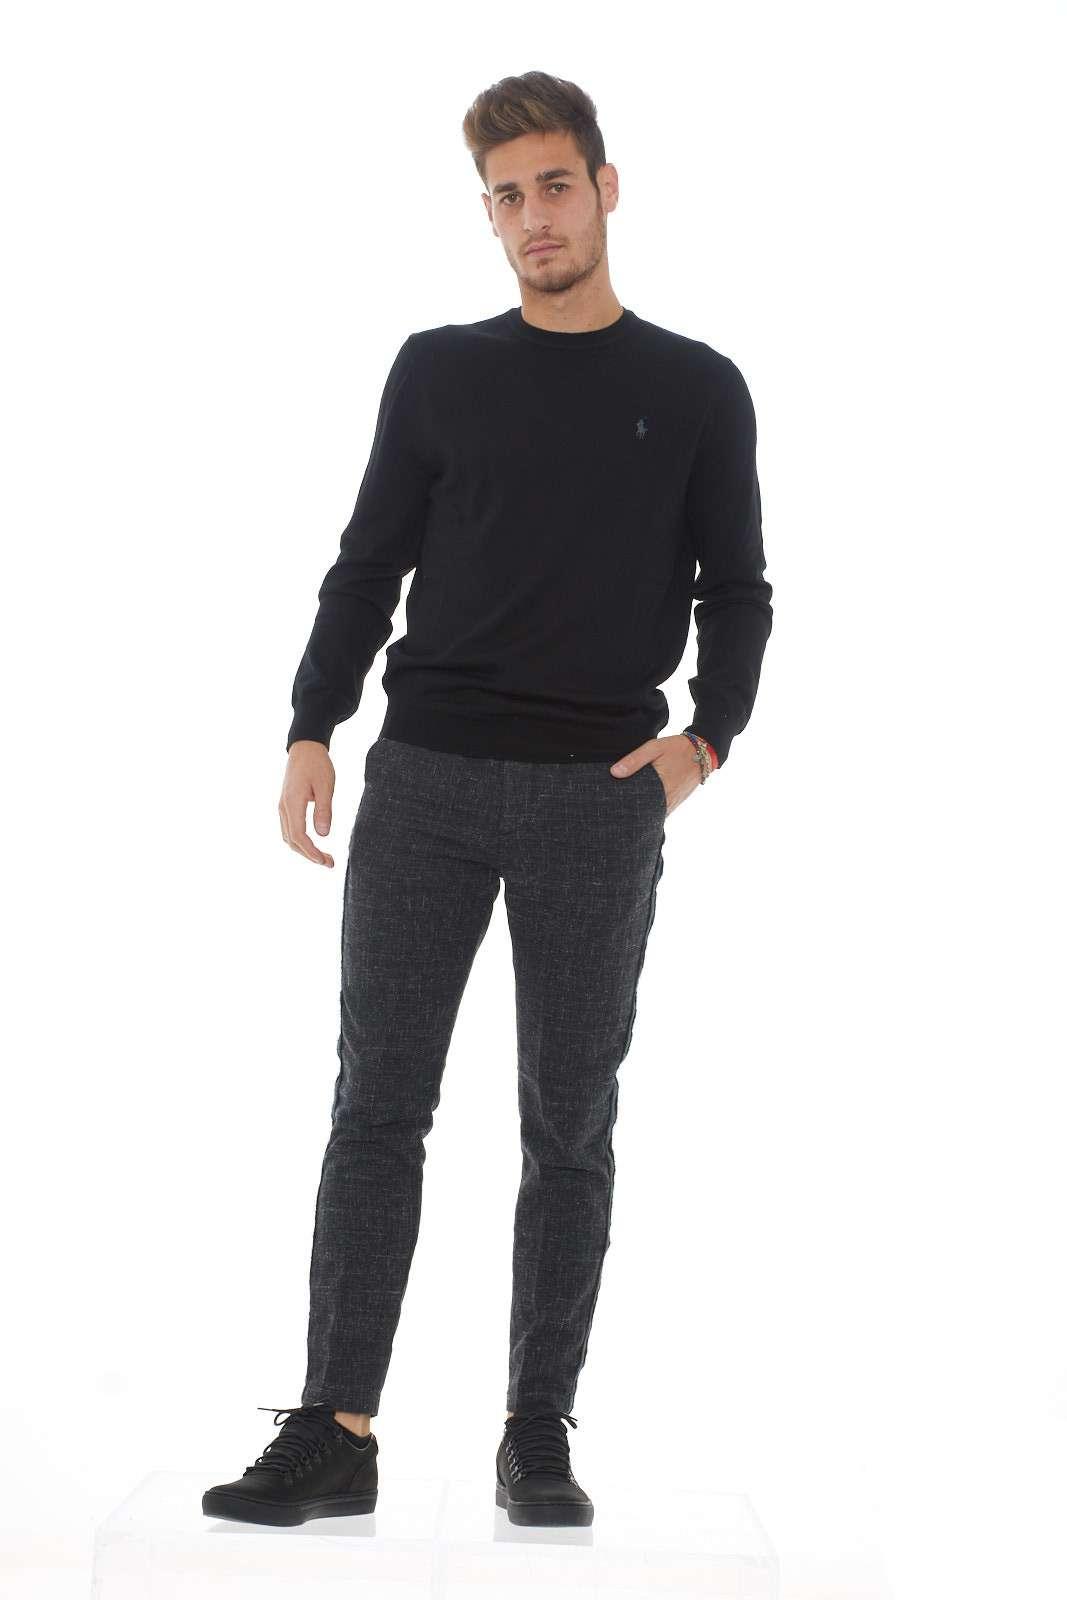 https://www.parmax.com/media/catalog/product/A/I/AI-outlet_parmax-pantaloni-uomo-Squad-psc9722-D.jpg